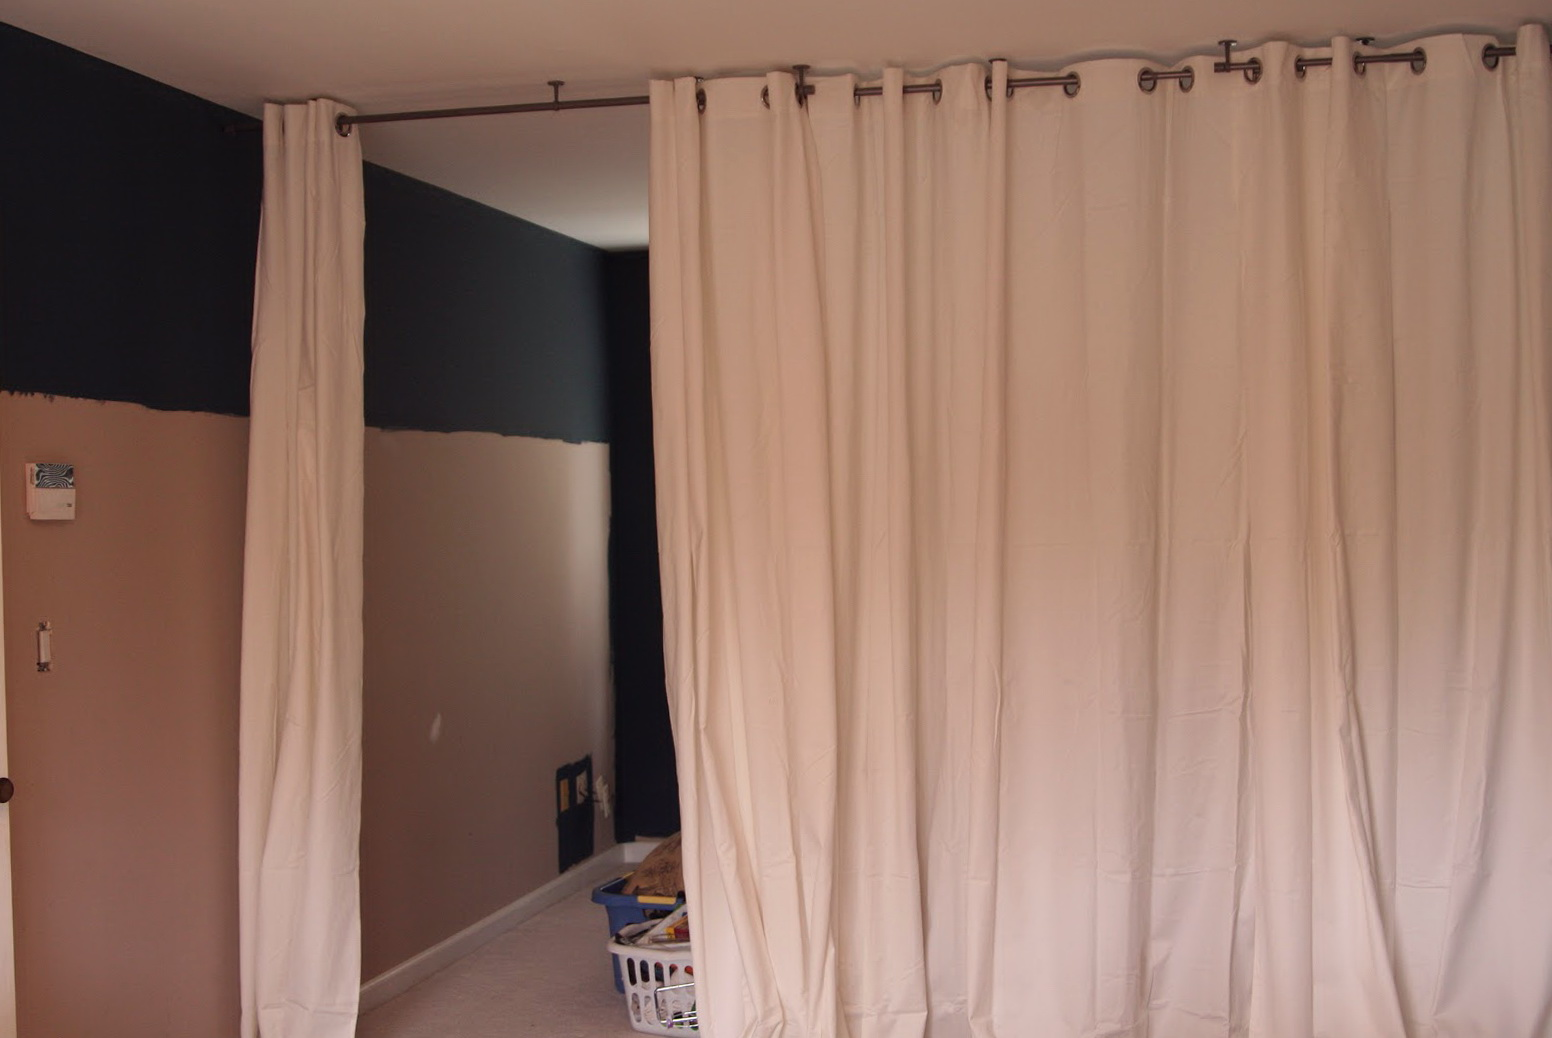 Room Divider Curtain Track Diy  Home Design Ideas